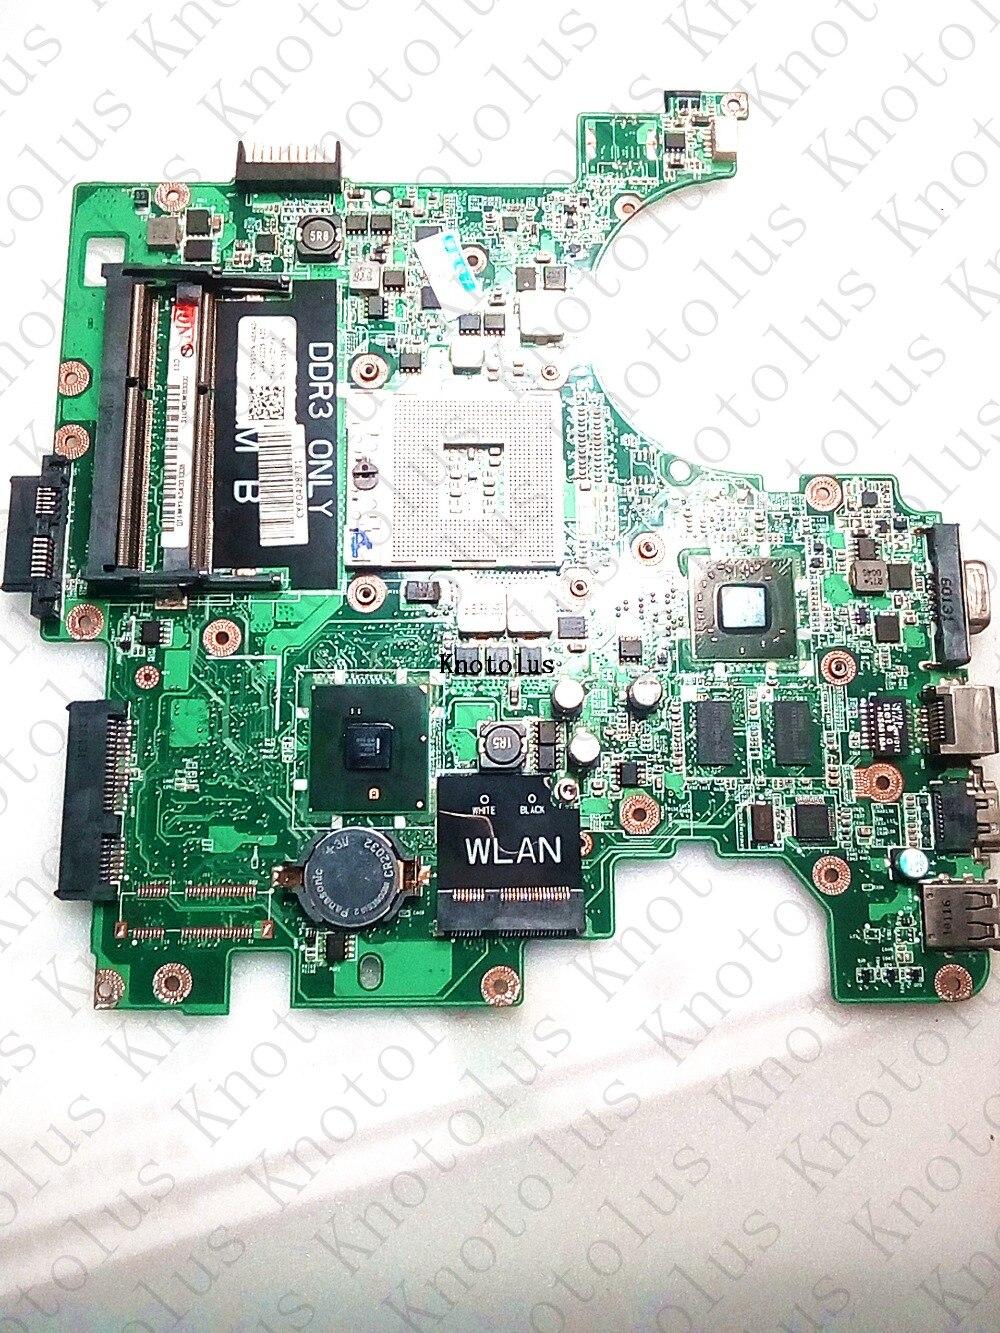 Для DELL Inspiron 1564 материнская плата для ноутбука ATI DDR3 06T28N DA0UM3MB8E0 Бесплатная доставка 100% ТЕСТ ОК